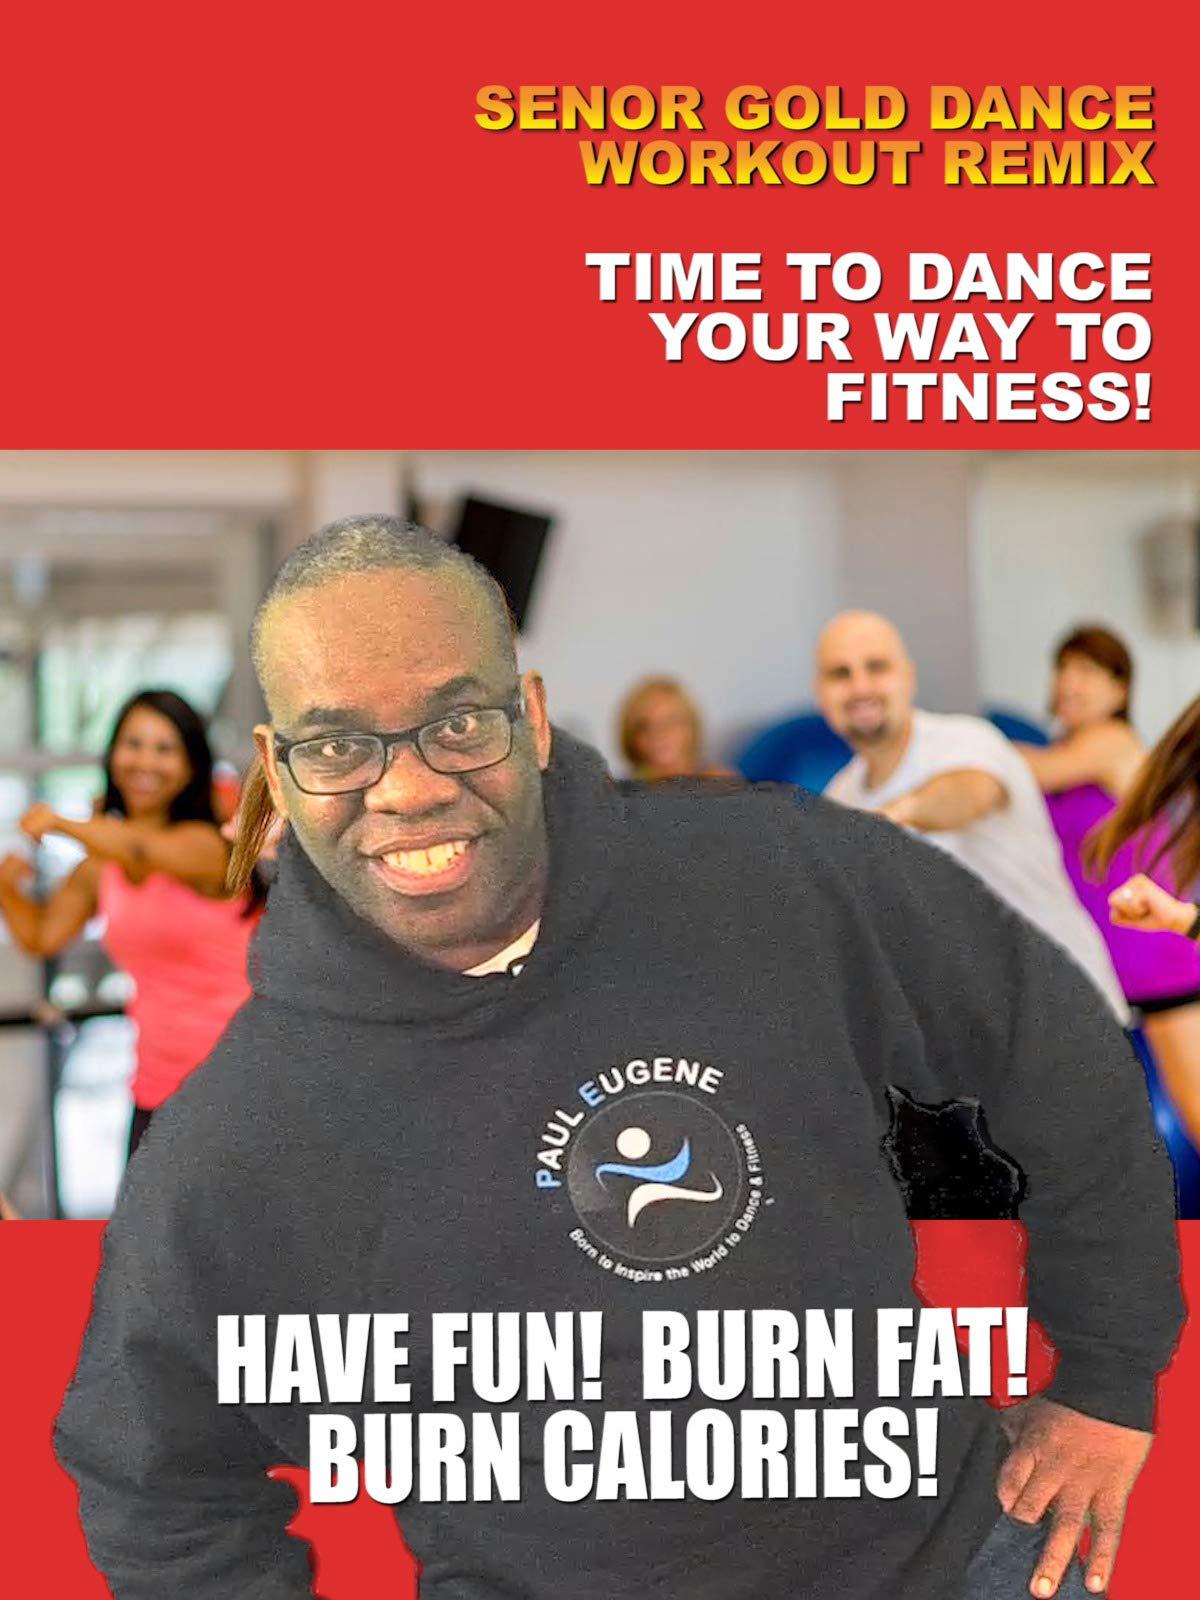 Senor Gold Dance Workout Remix